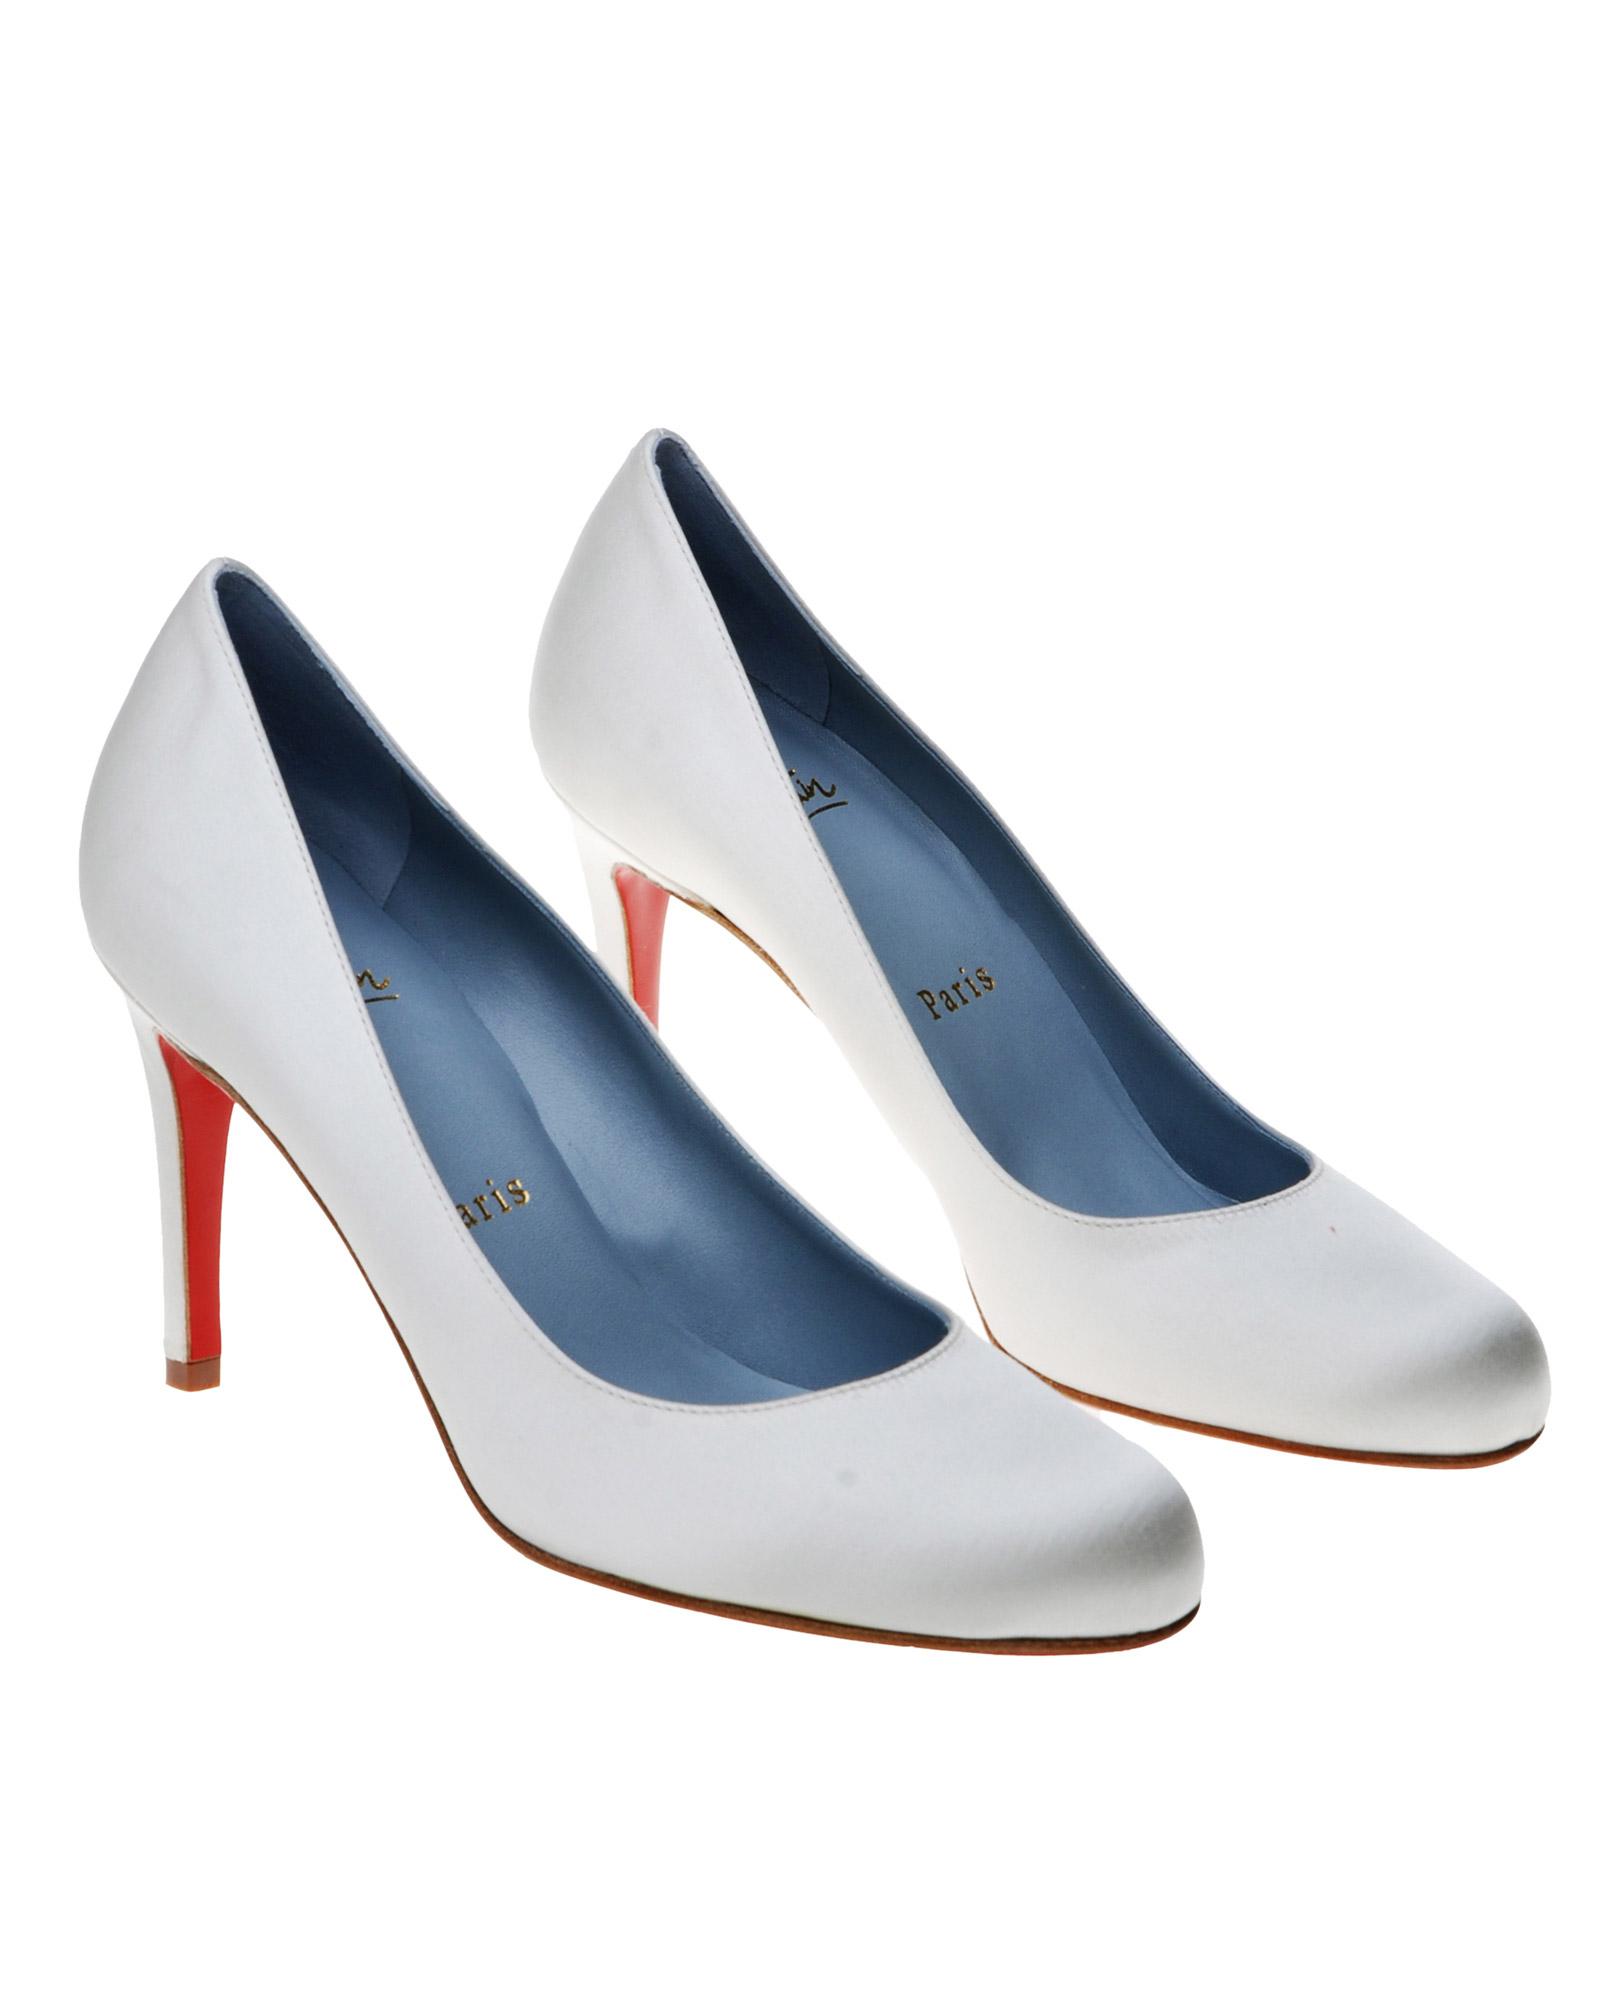 7eeab30b35e Christian Louboutin White The Simple Pump Bridal Shoe